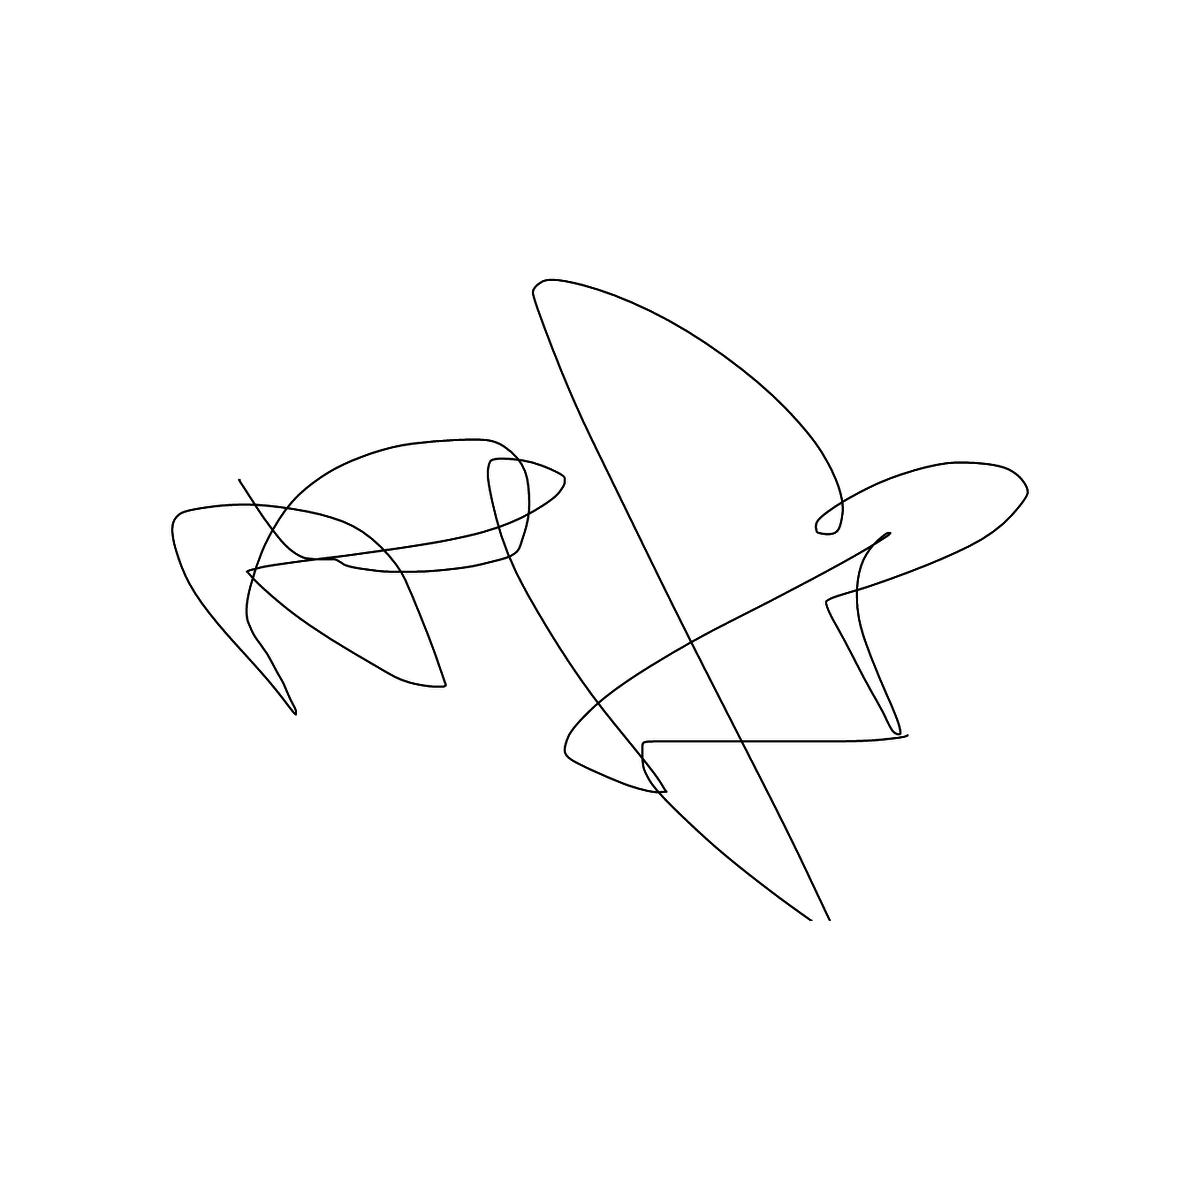 BAAAM drawing#23367 lat:56.5467681884765600lng: -44.1195220947265600